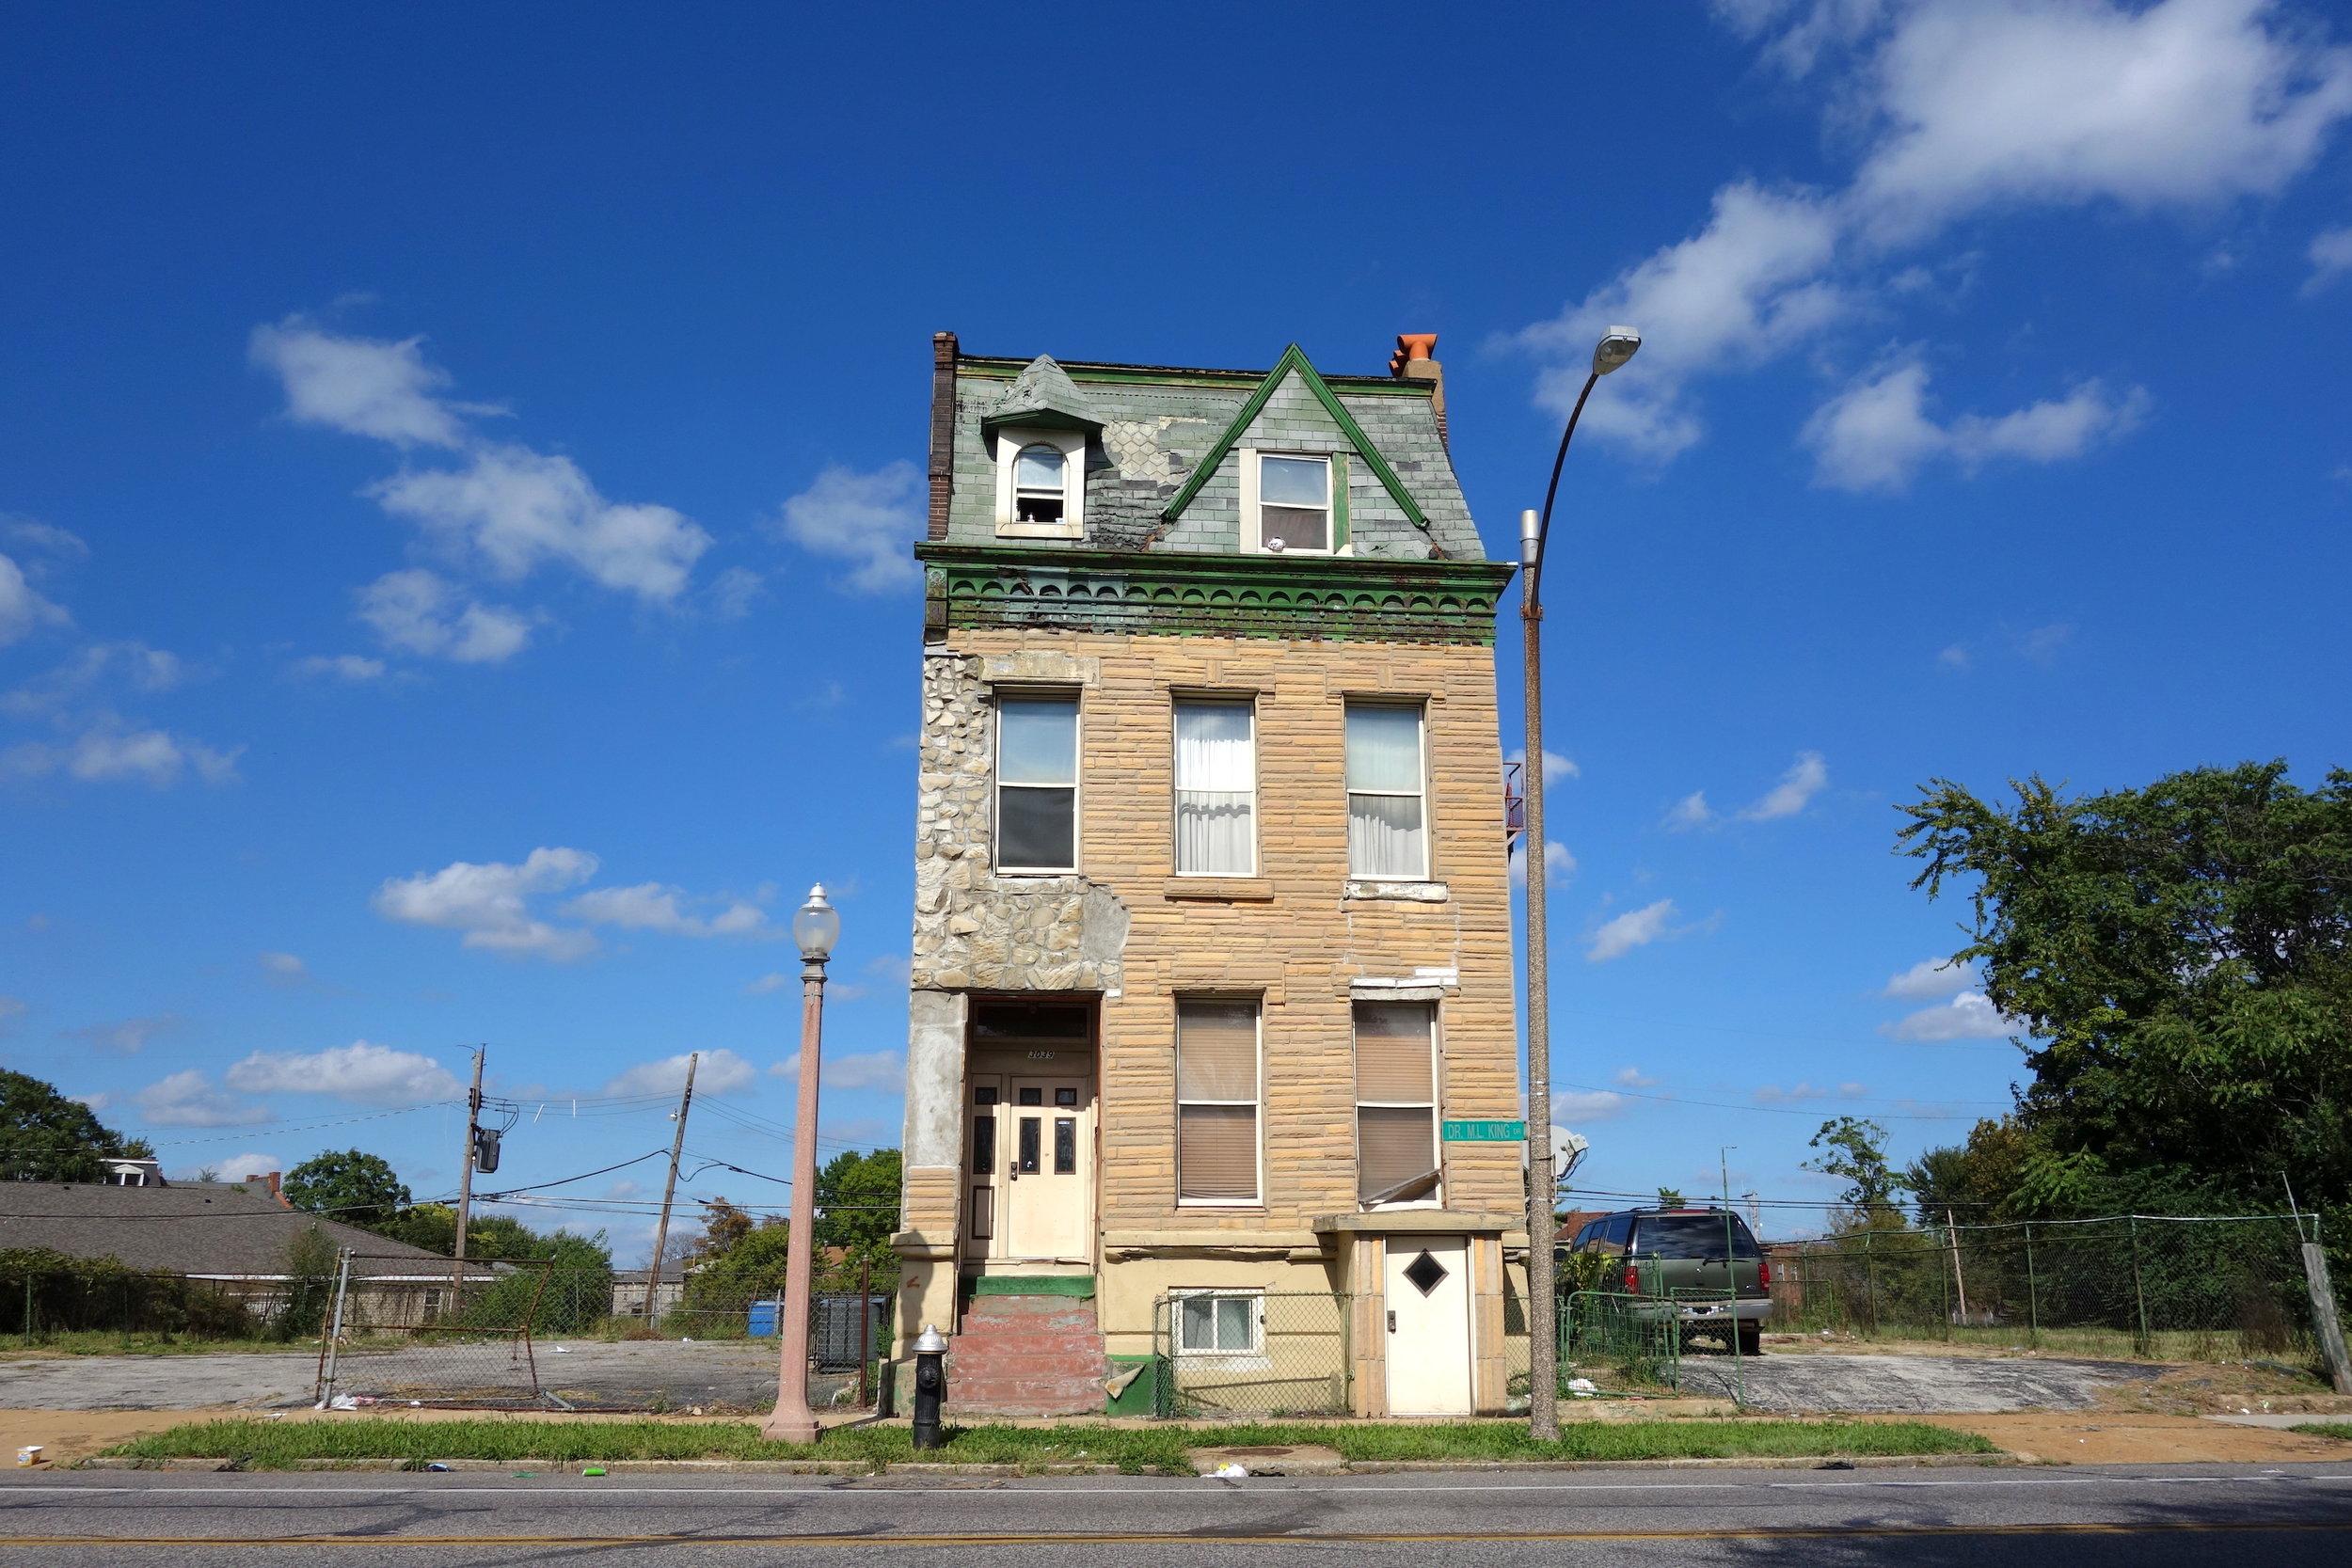 Figure 5. Last house on the block, Delmar Boulevard, St. Louis, 2016. Photograph by Joseph Heathcott.